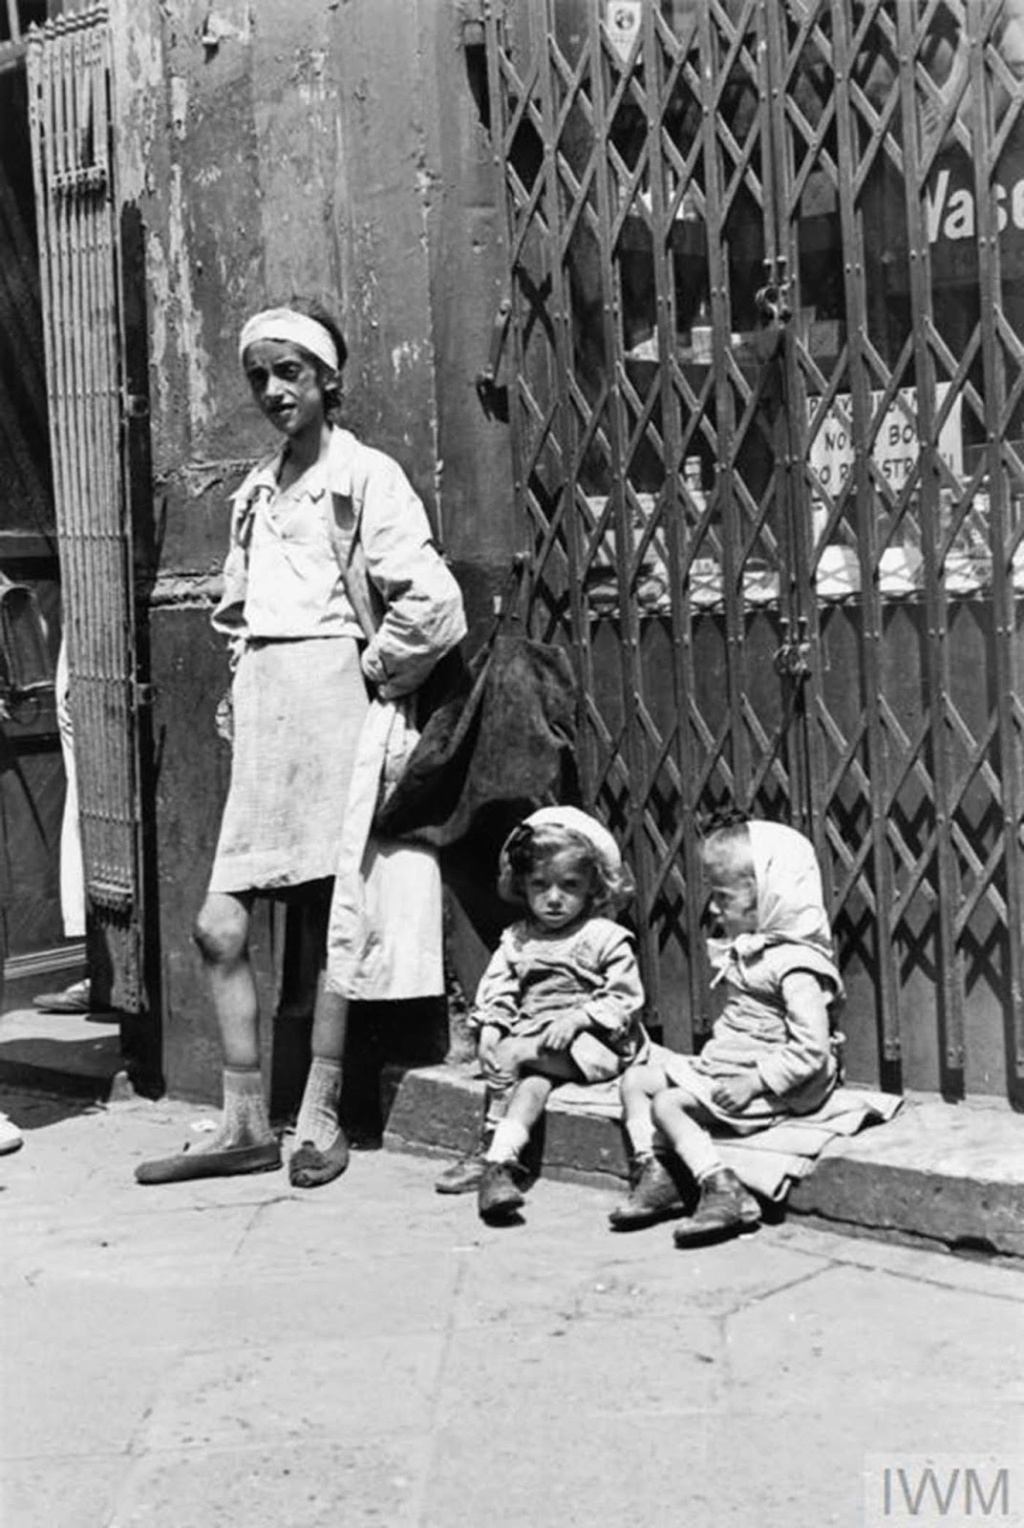 Diverses photos de la WWII - Page 40 95111